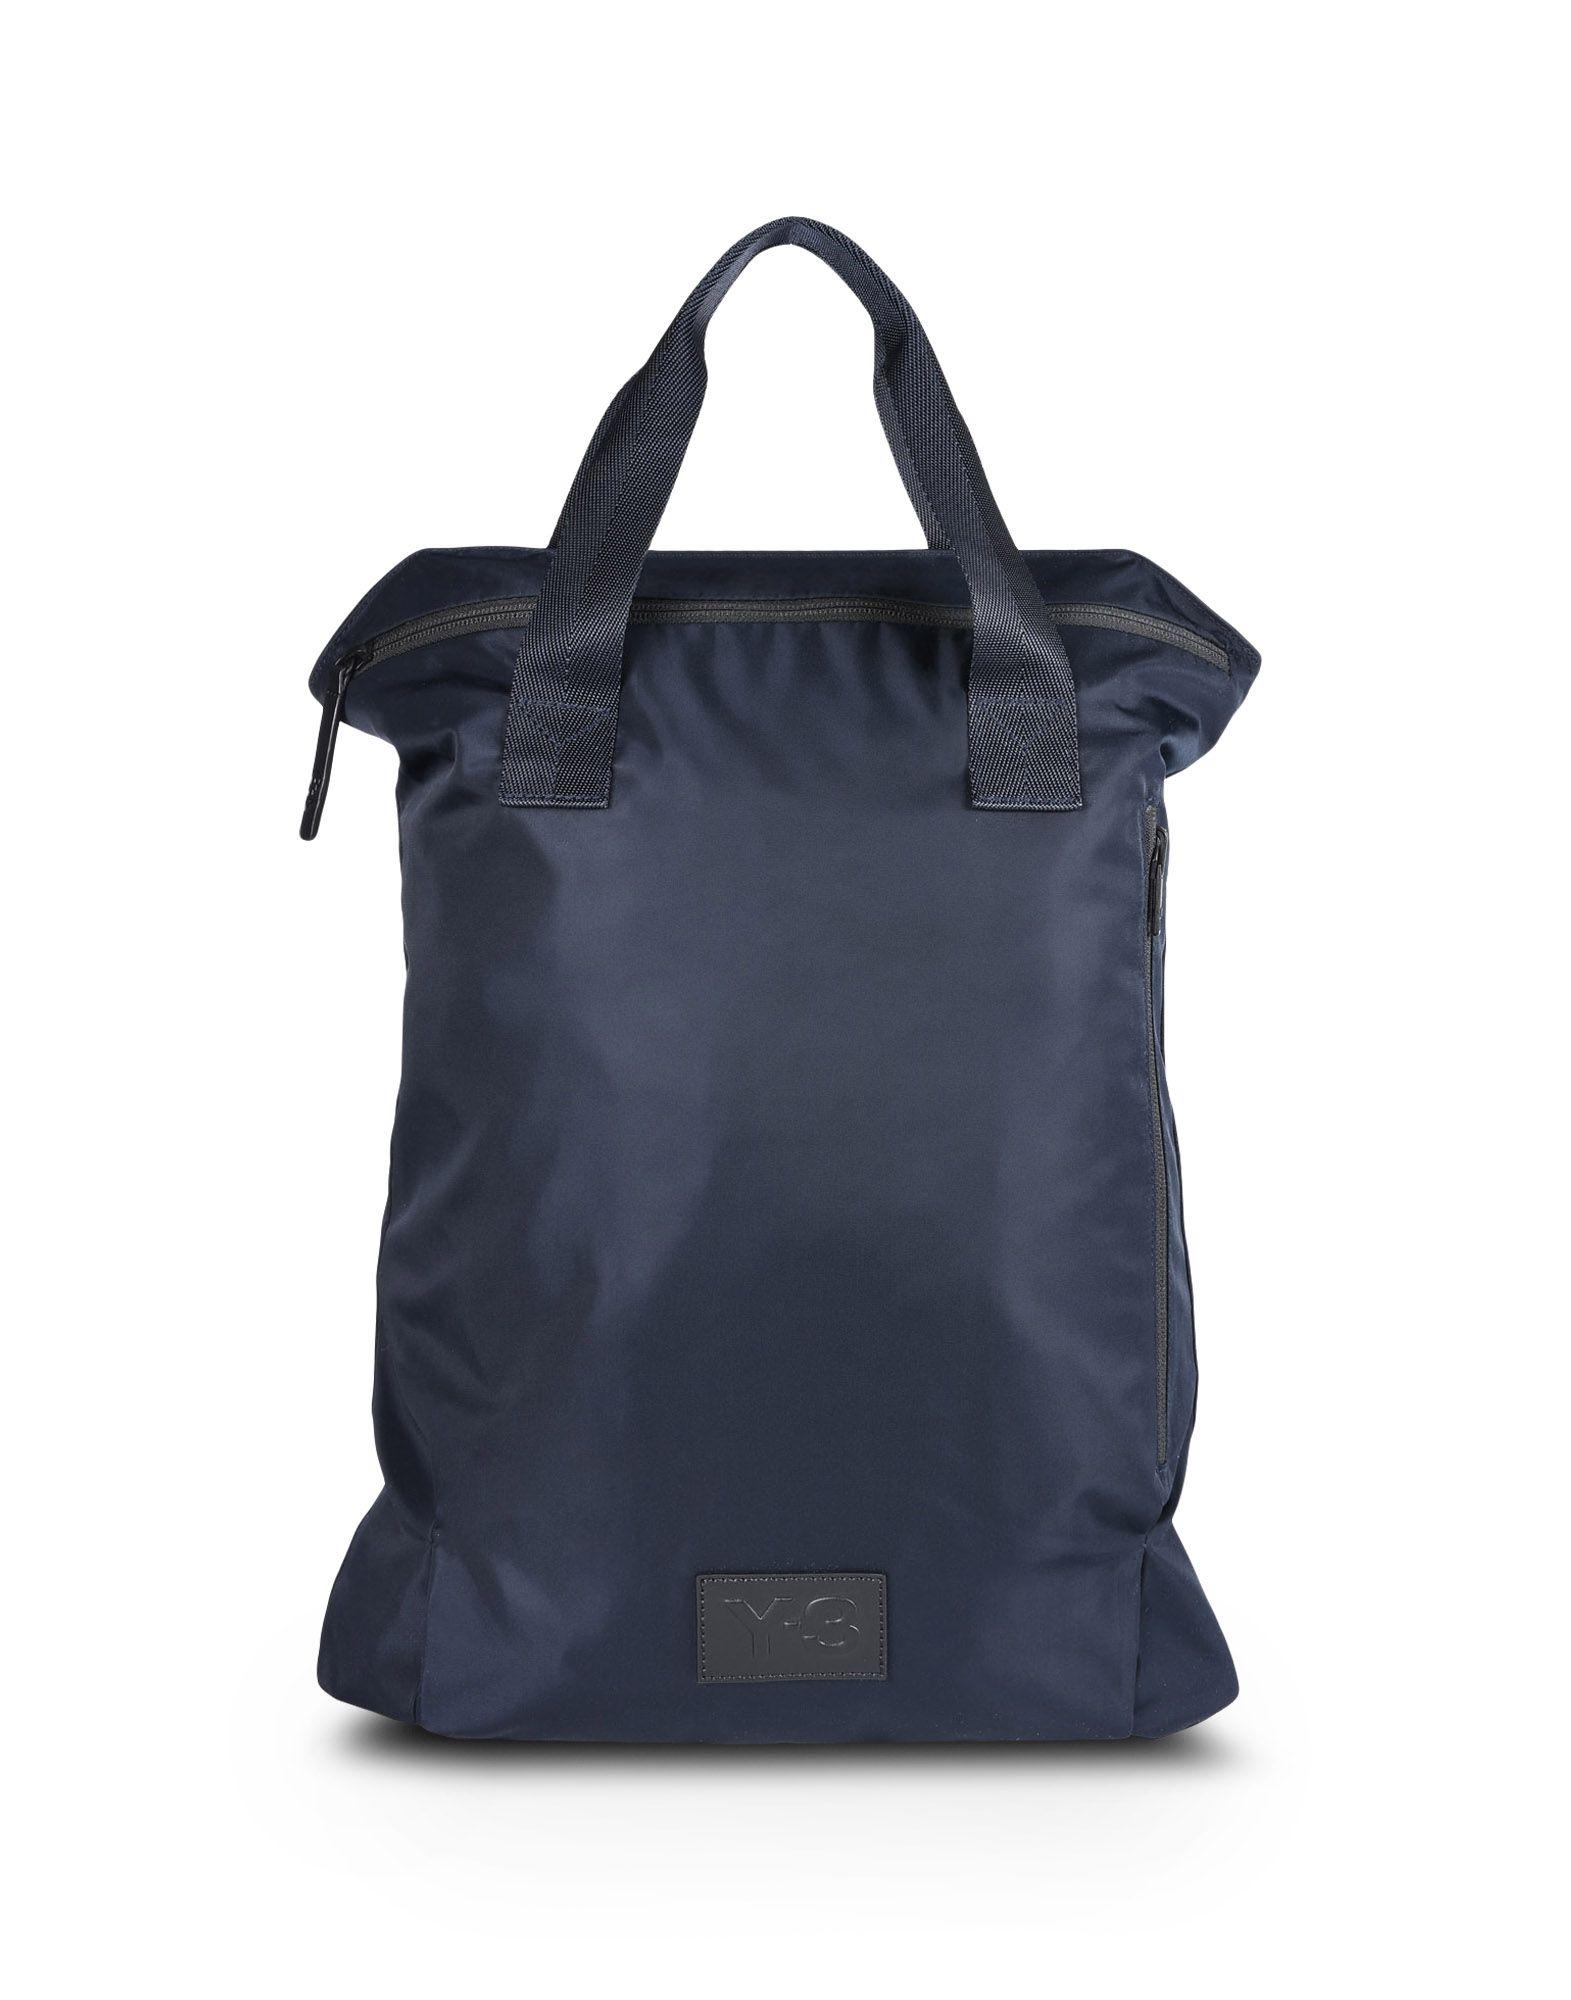 ... Y-3 Y-3 PACKABLE BACKPACK Backpack E f ... 62378ba32cde6